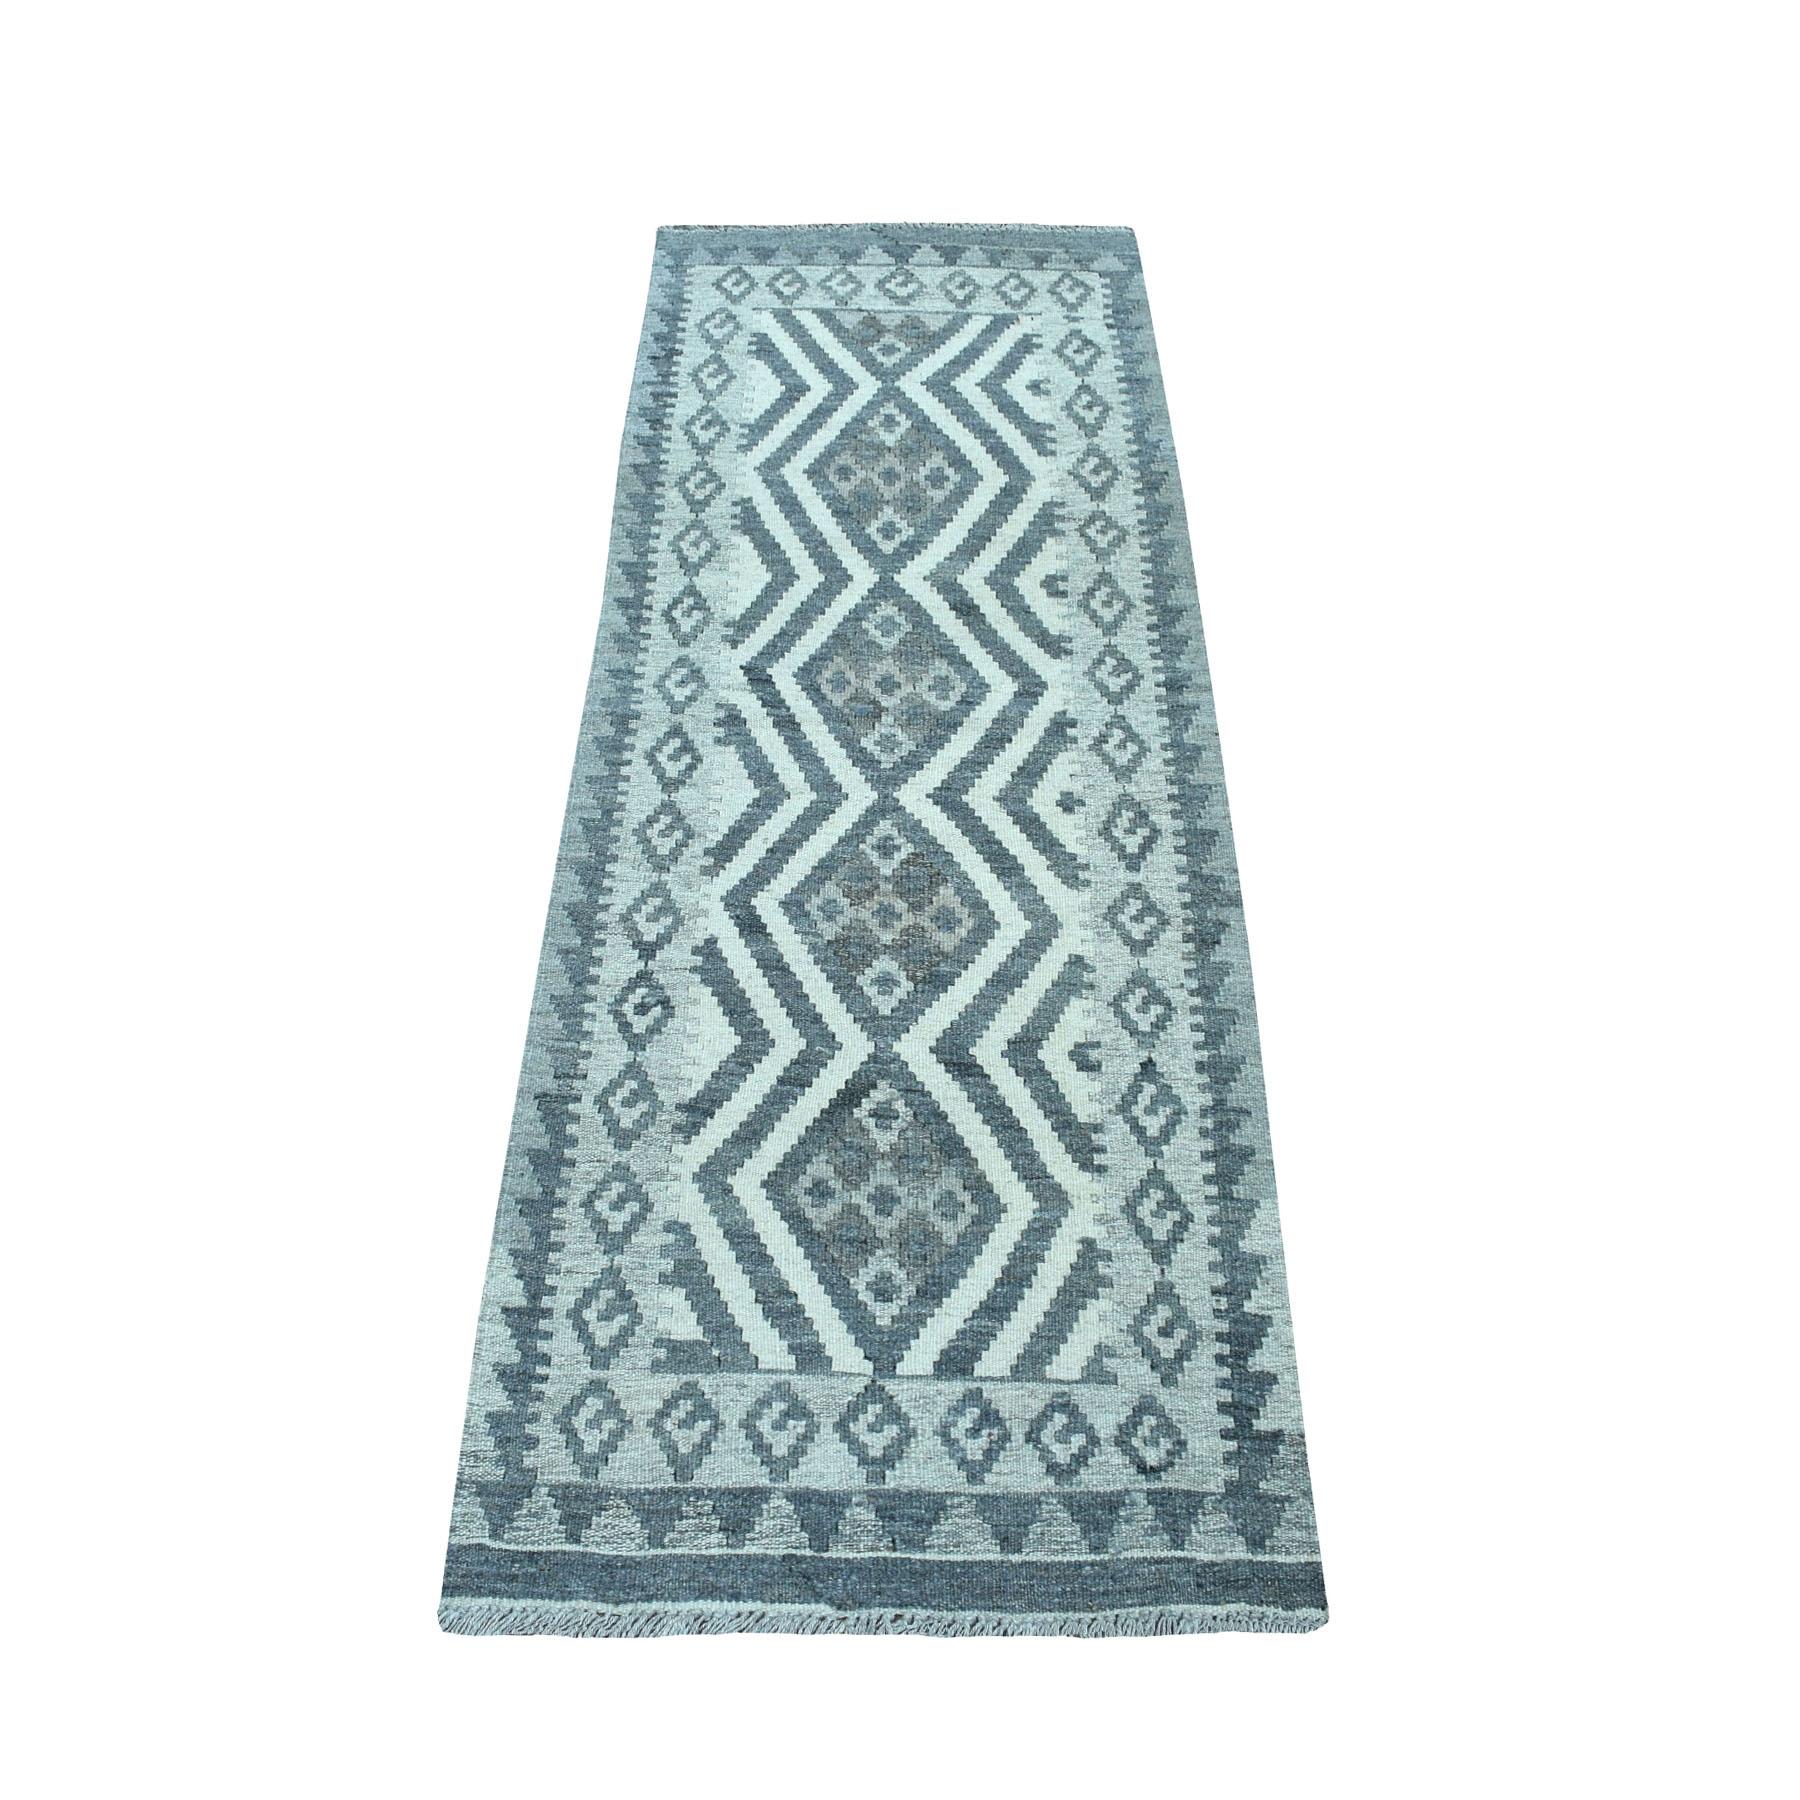 "2'1""x6' Undyed Natural Wool Afghan Kilim Reversible Hand Woven Runner Oriental Rug"